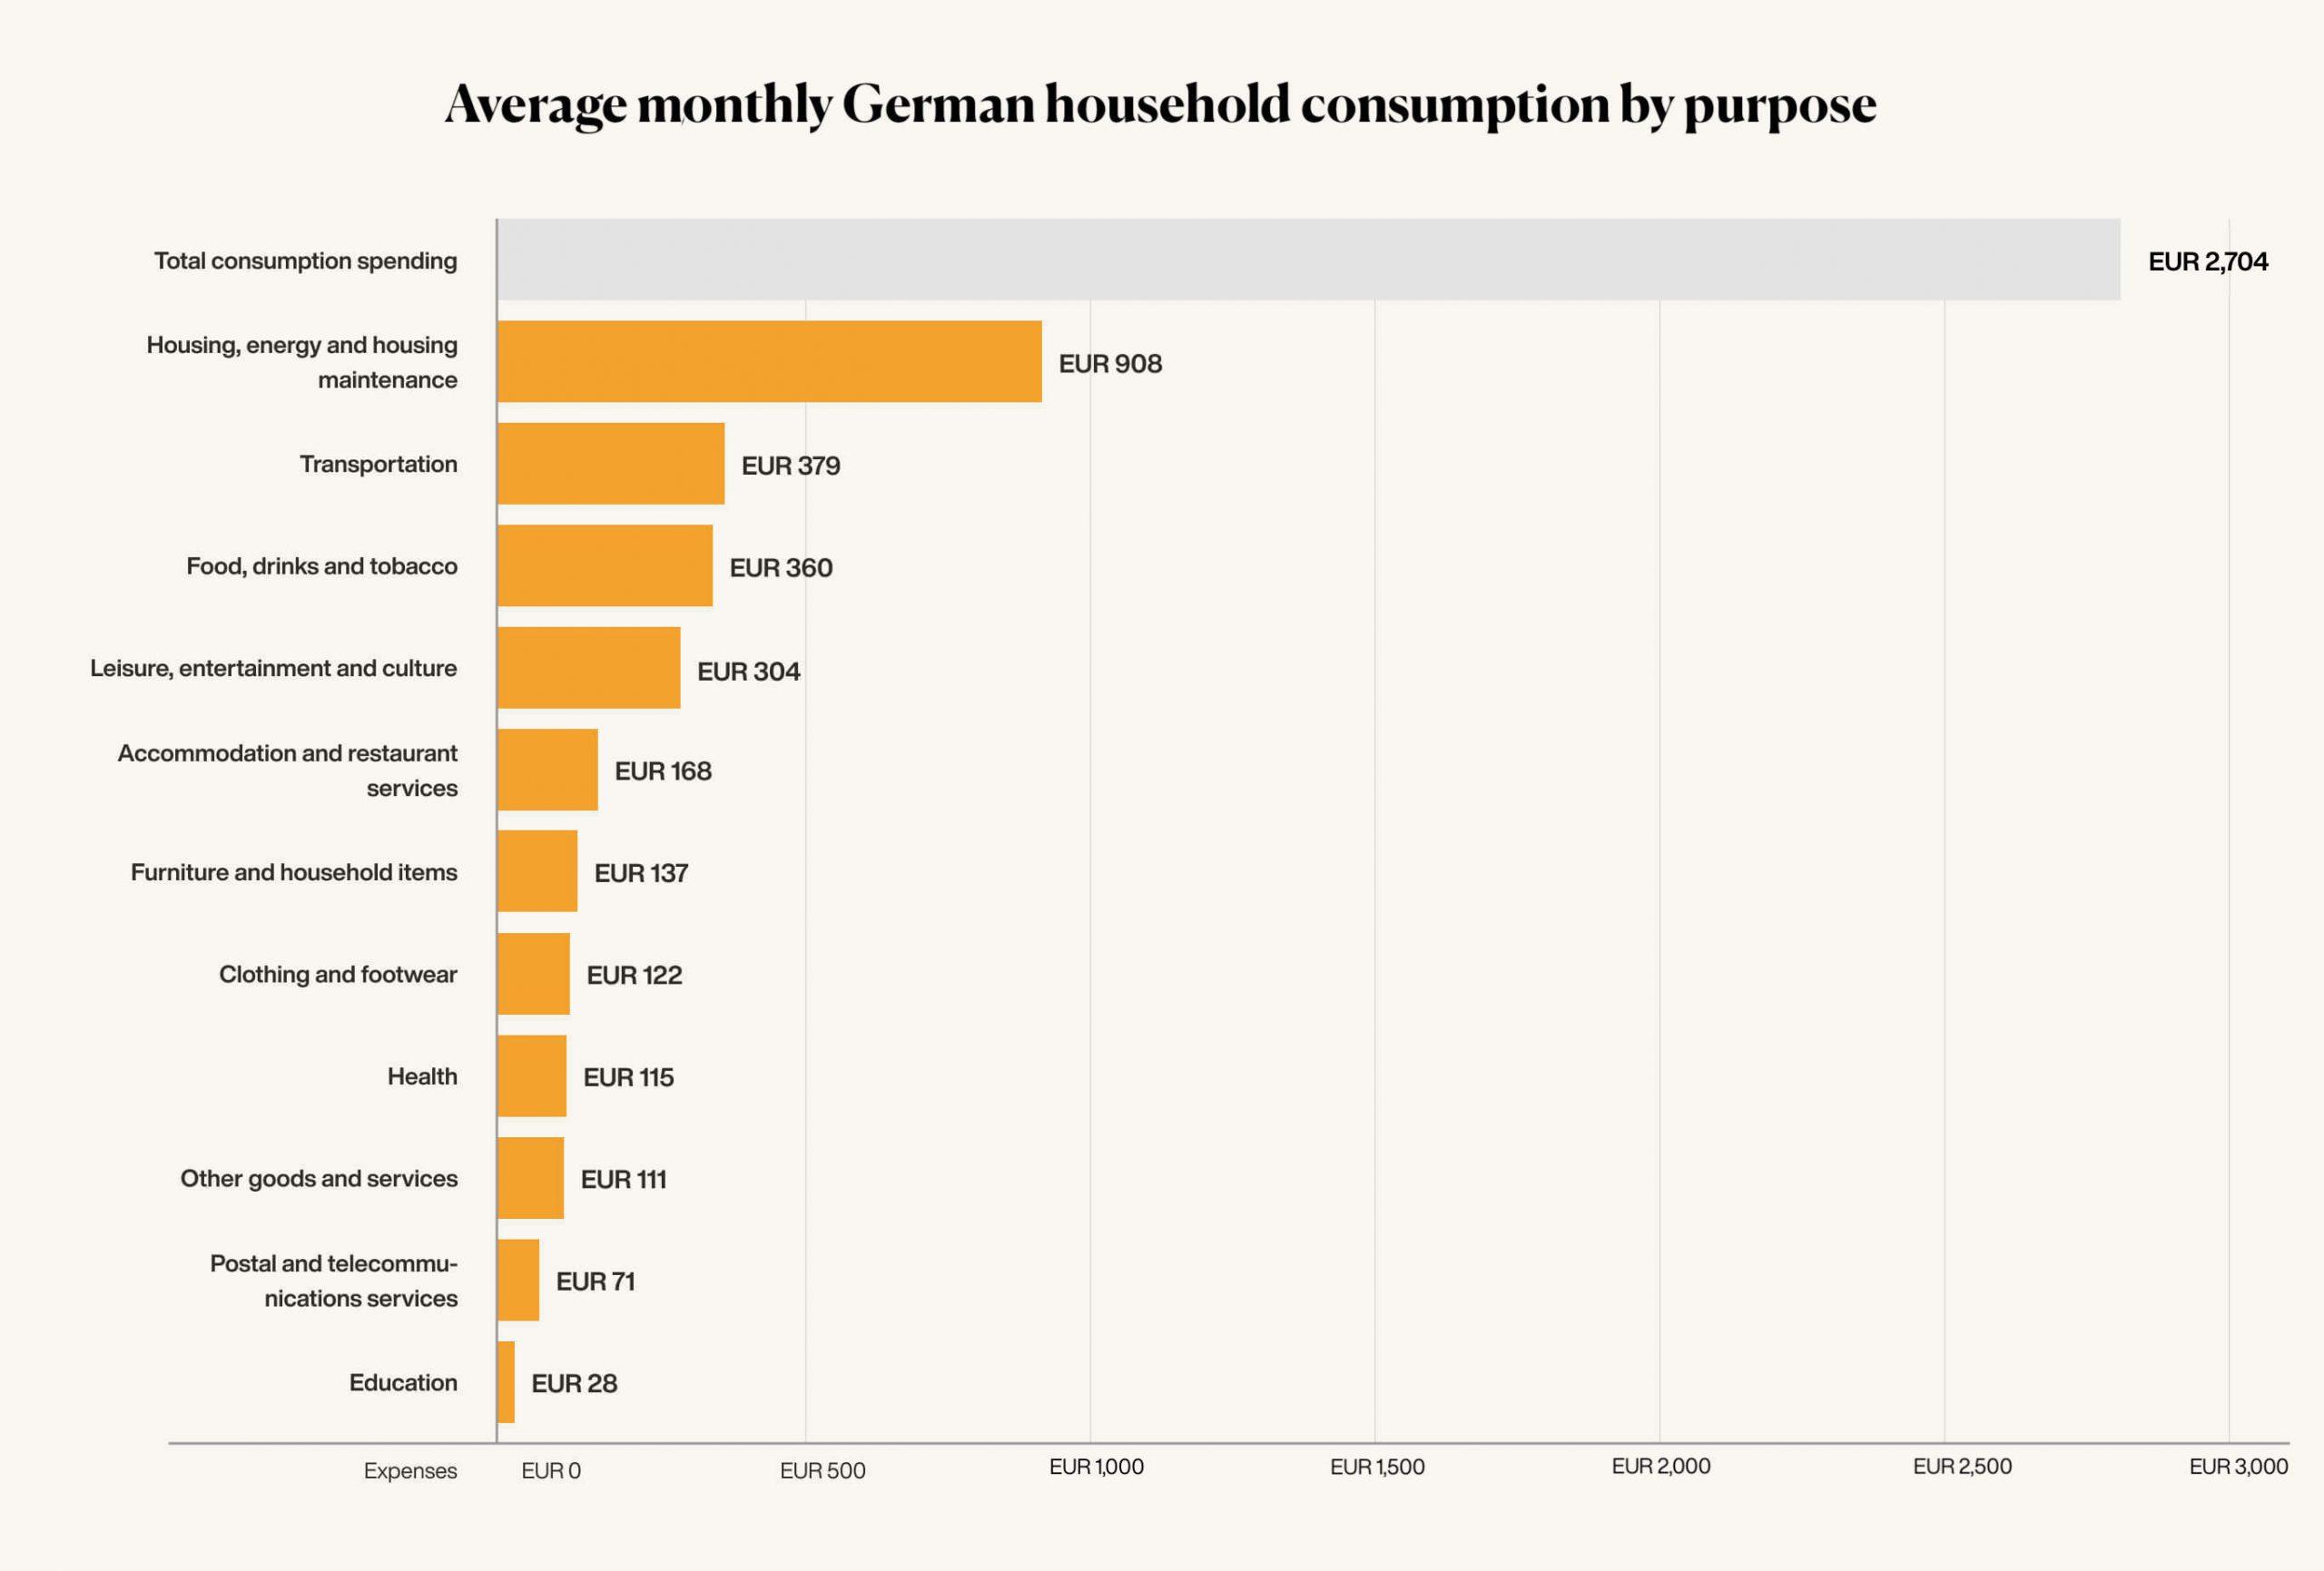 monthly savings per household in Germany